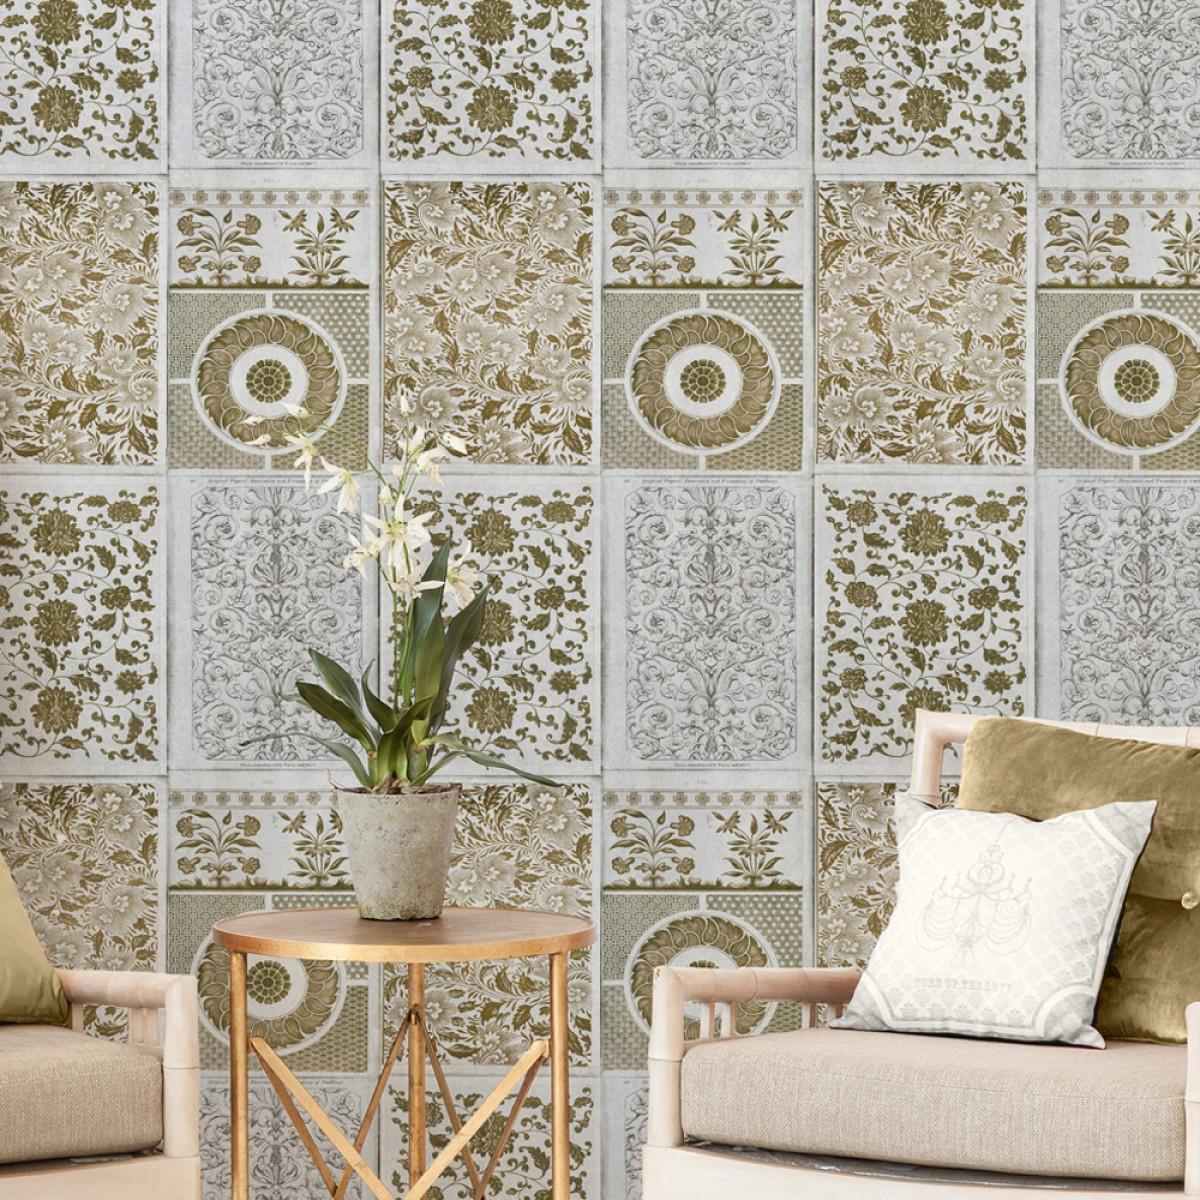 Tapet designer World Culture Chinese Patterns Brown, MINDTHEGAP